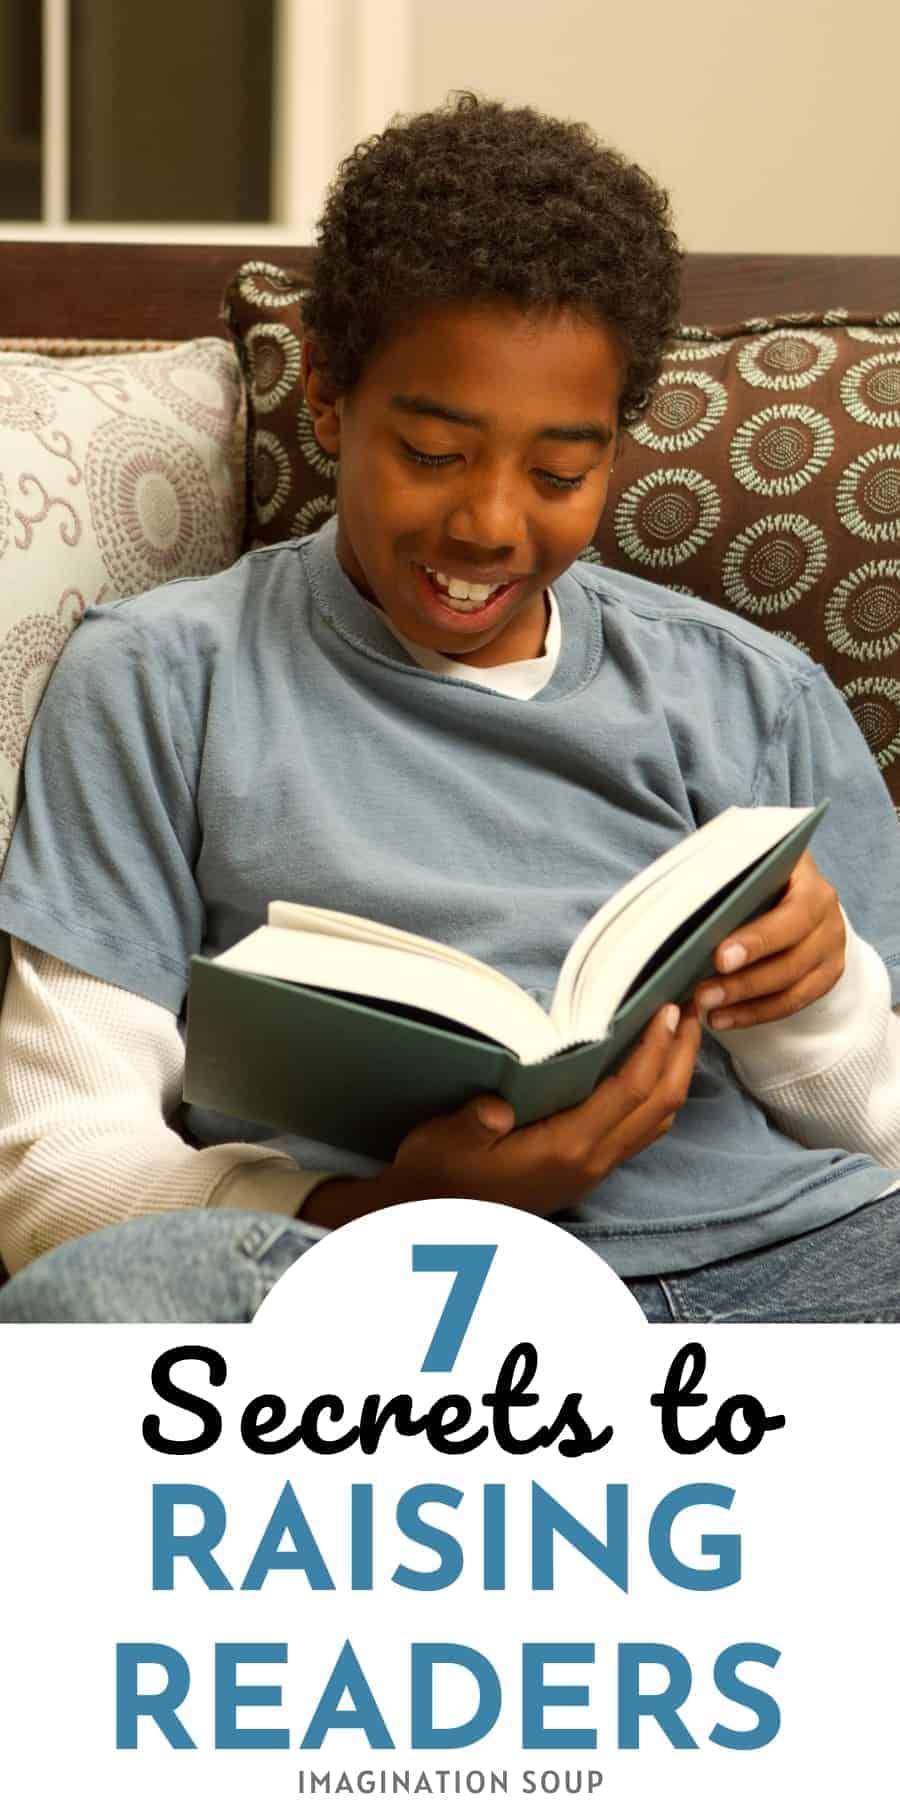 Seven Secrets to Raising Eager Readers